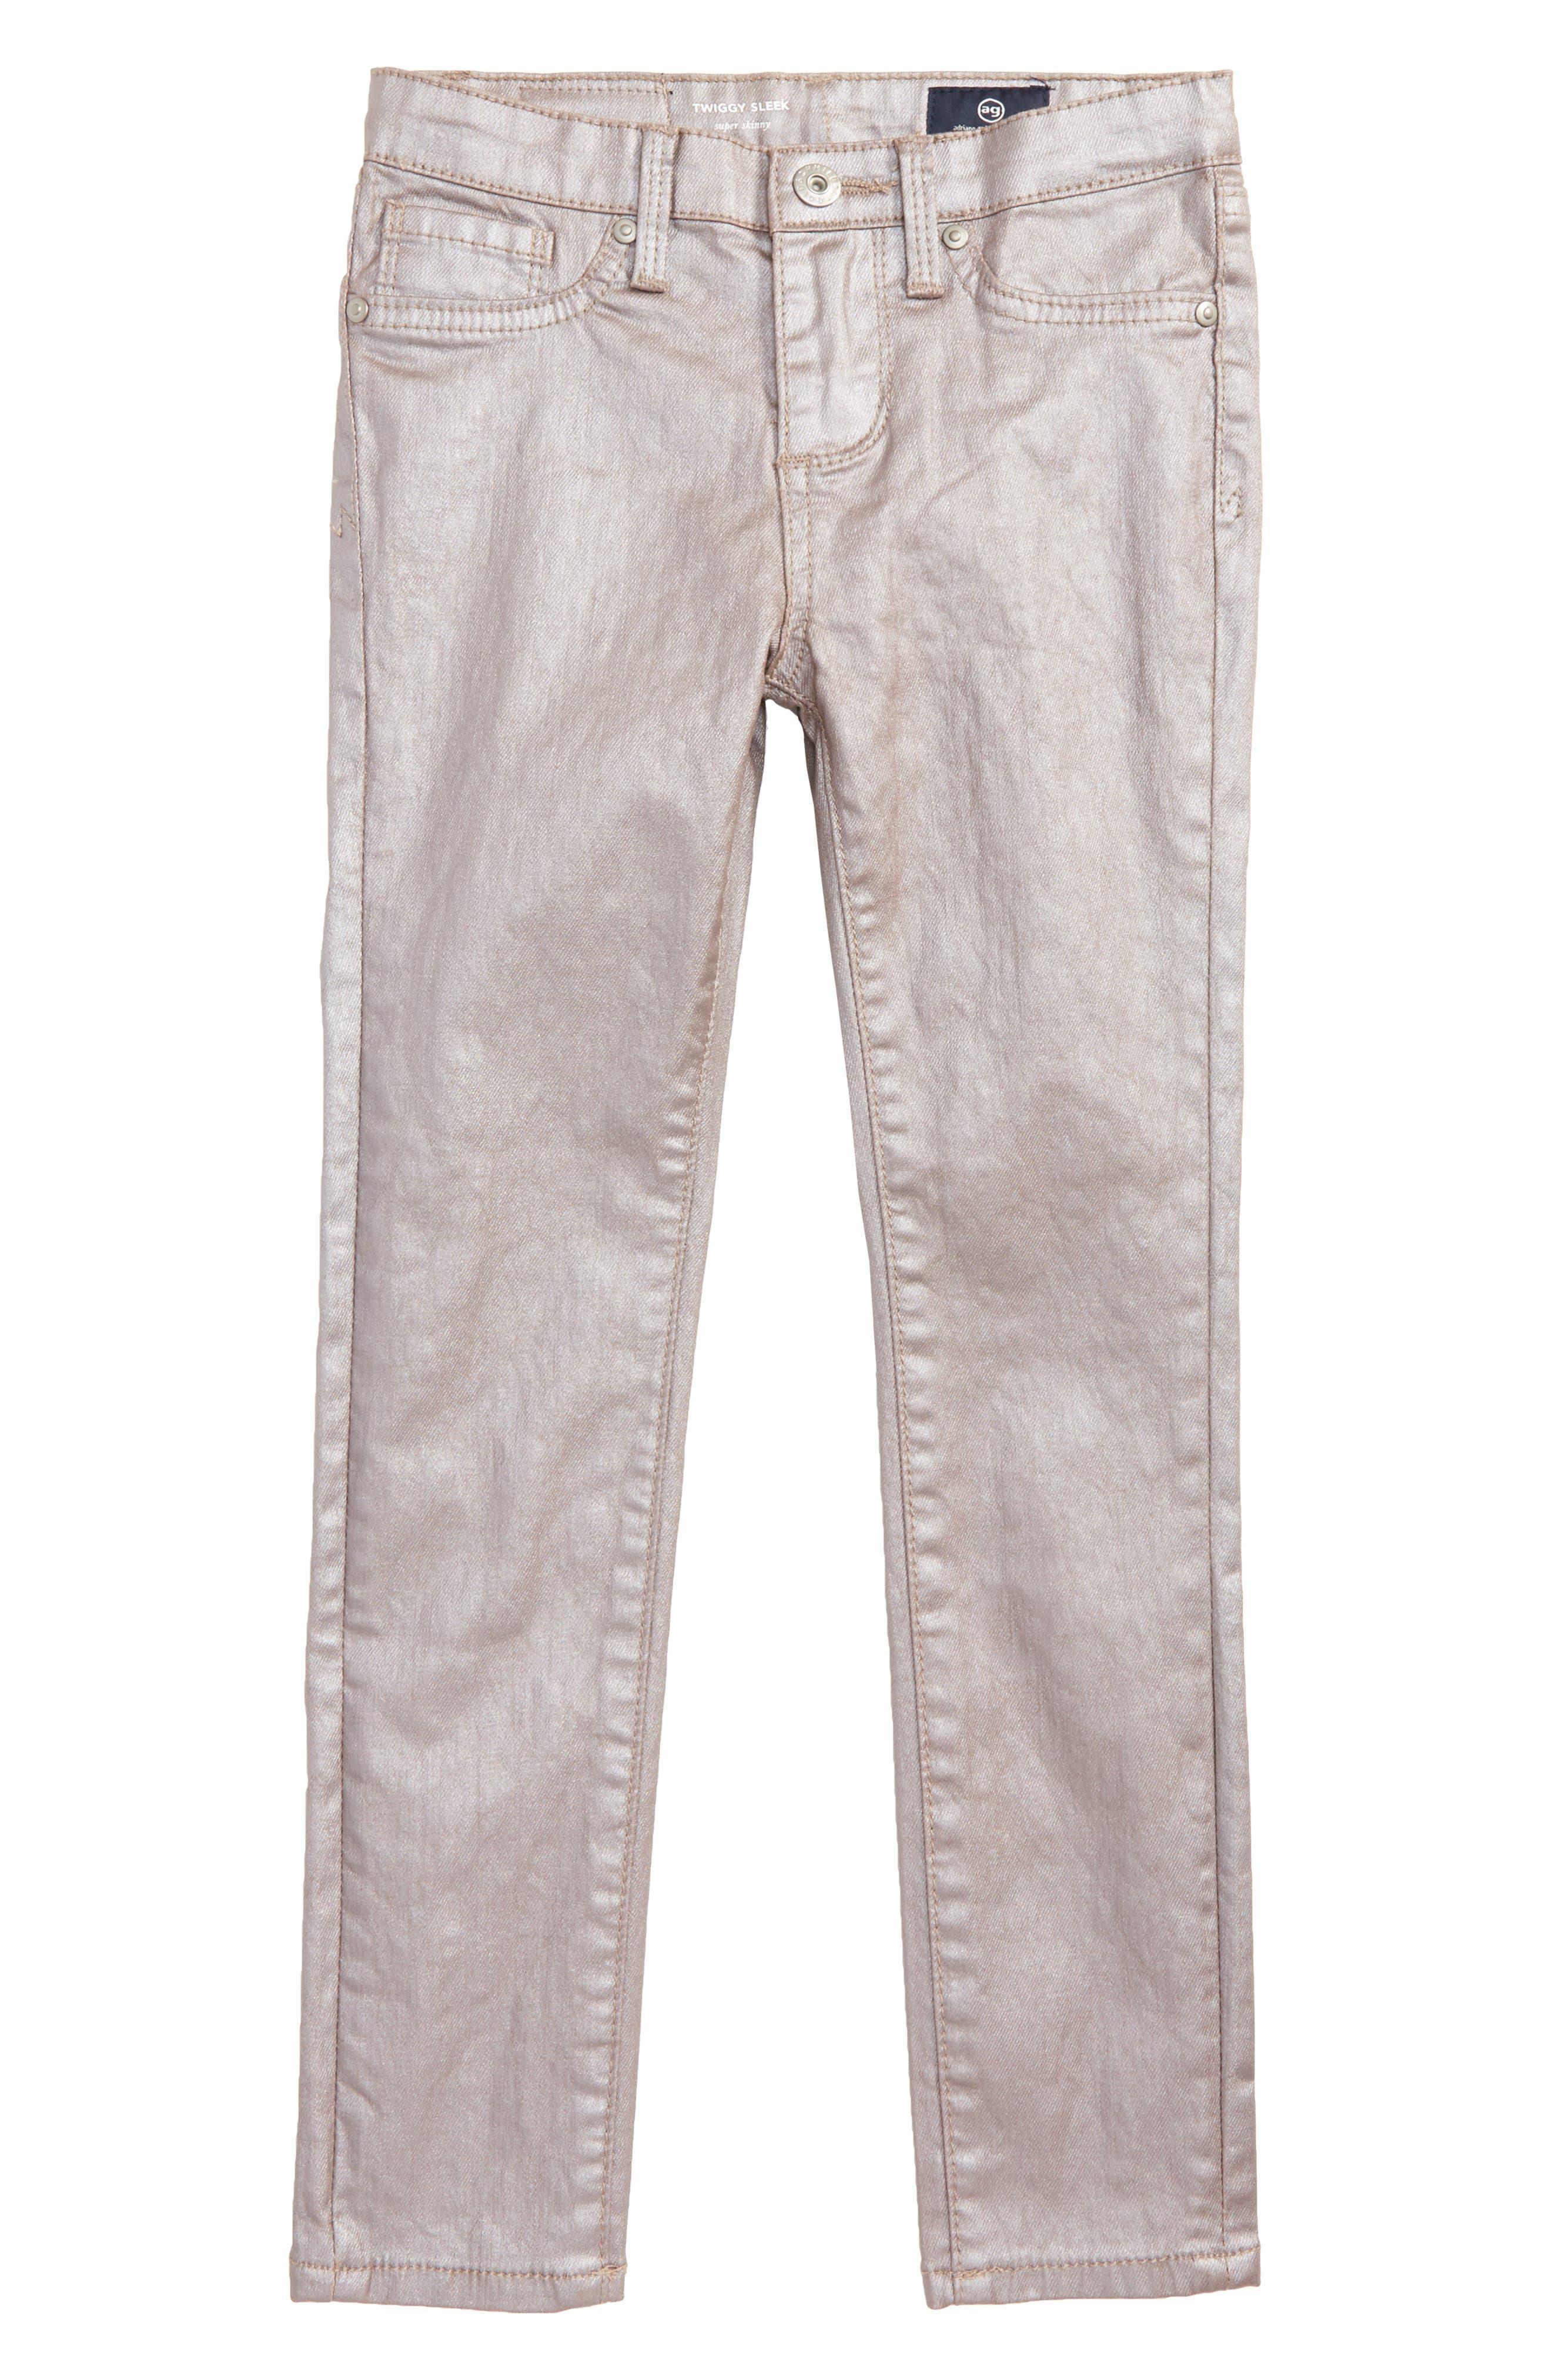 ag adriano goldschmied kids The Sleek Twiggy Skinny Ankle Jeans (Toddler Girls & Little Girls)